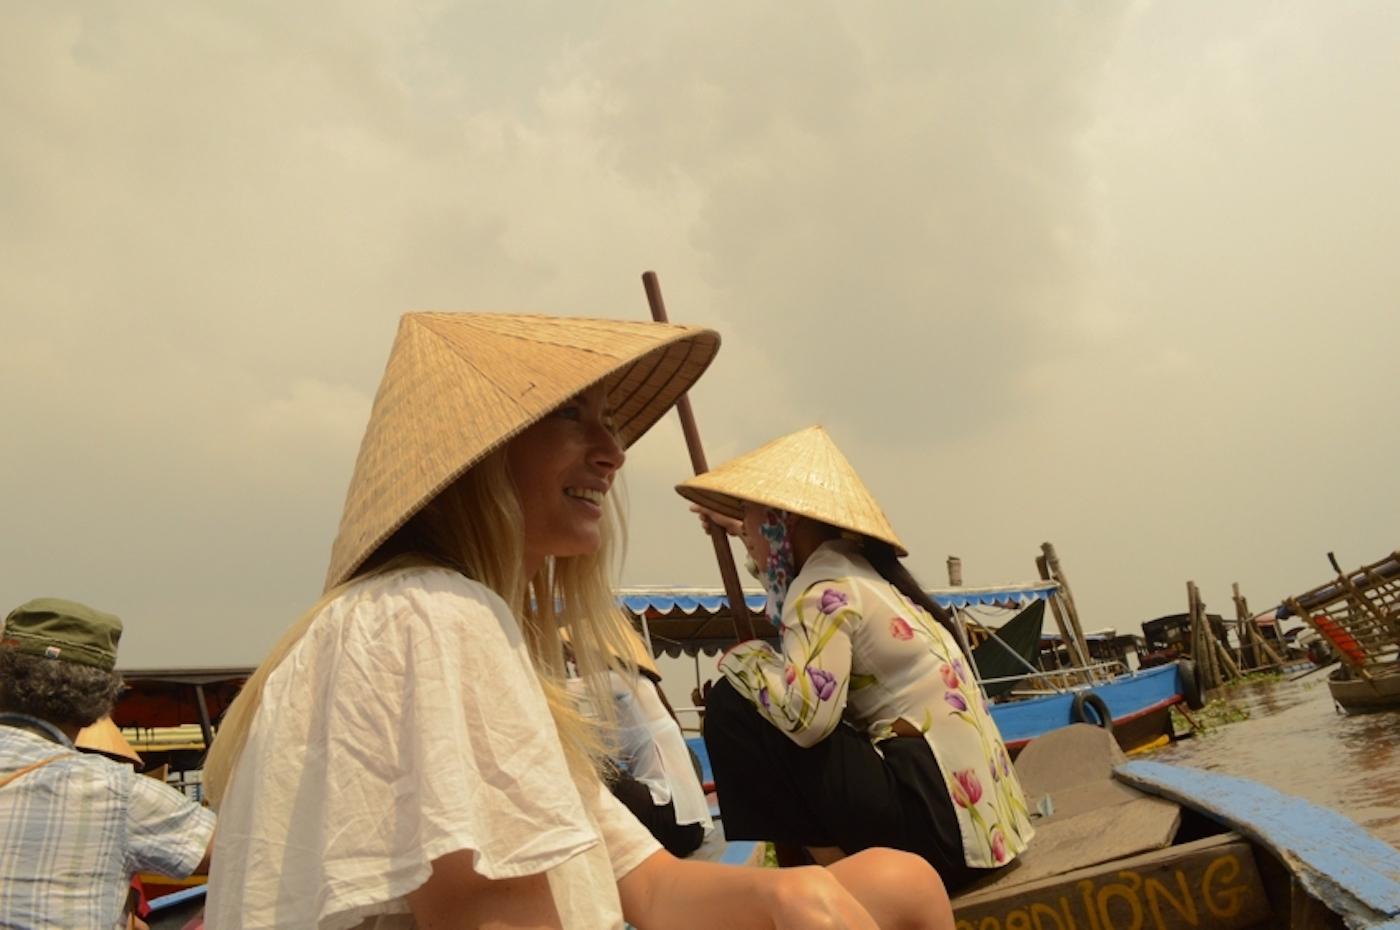 Laura-Cosoi-Delta-Mekong-27